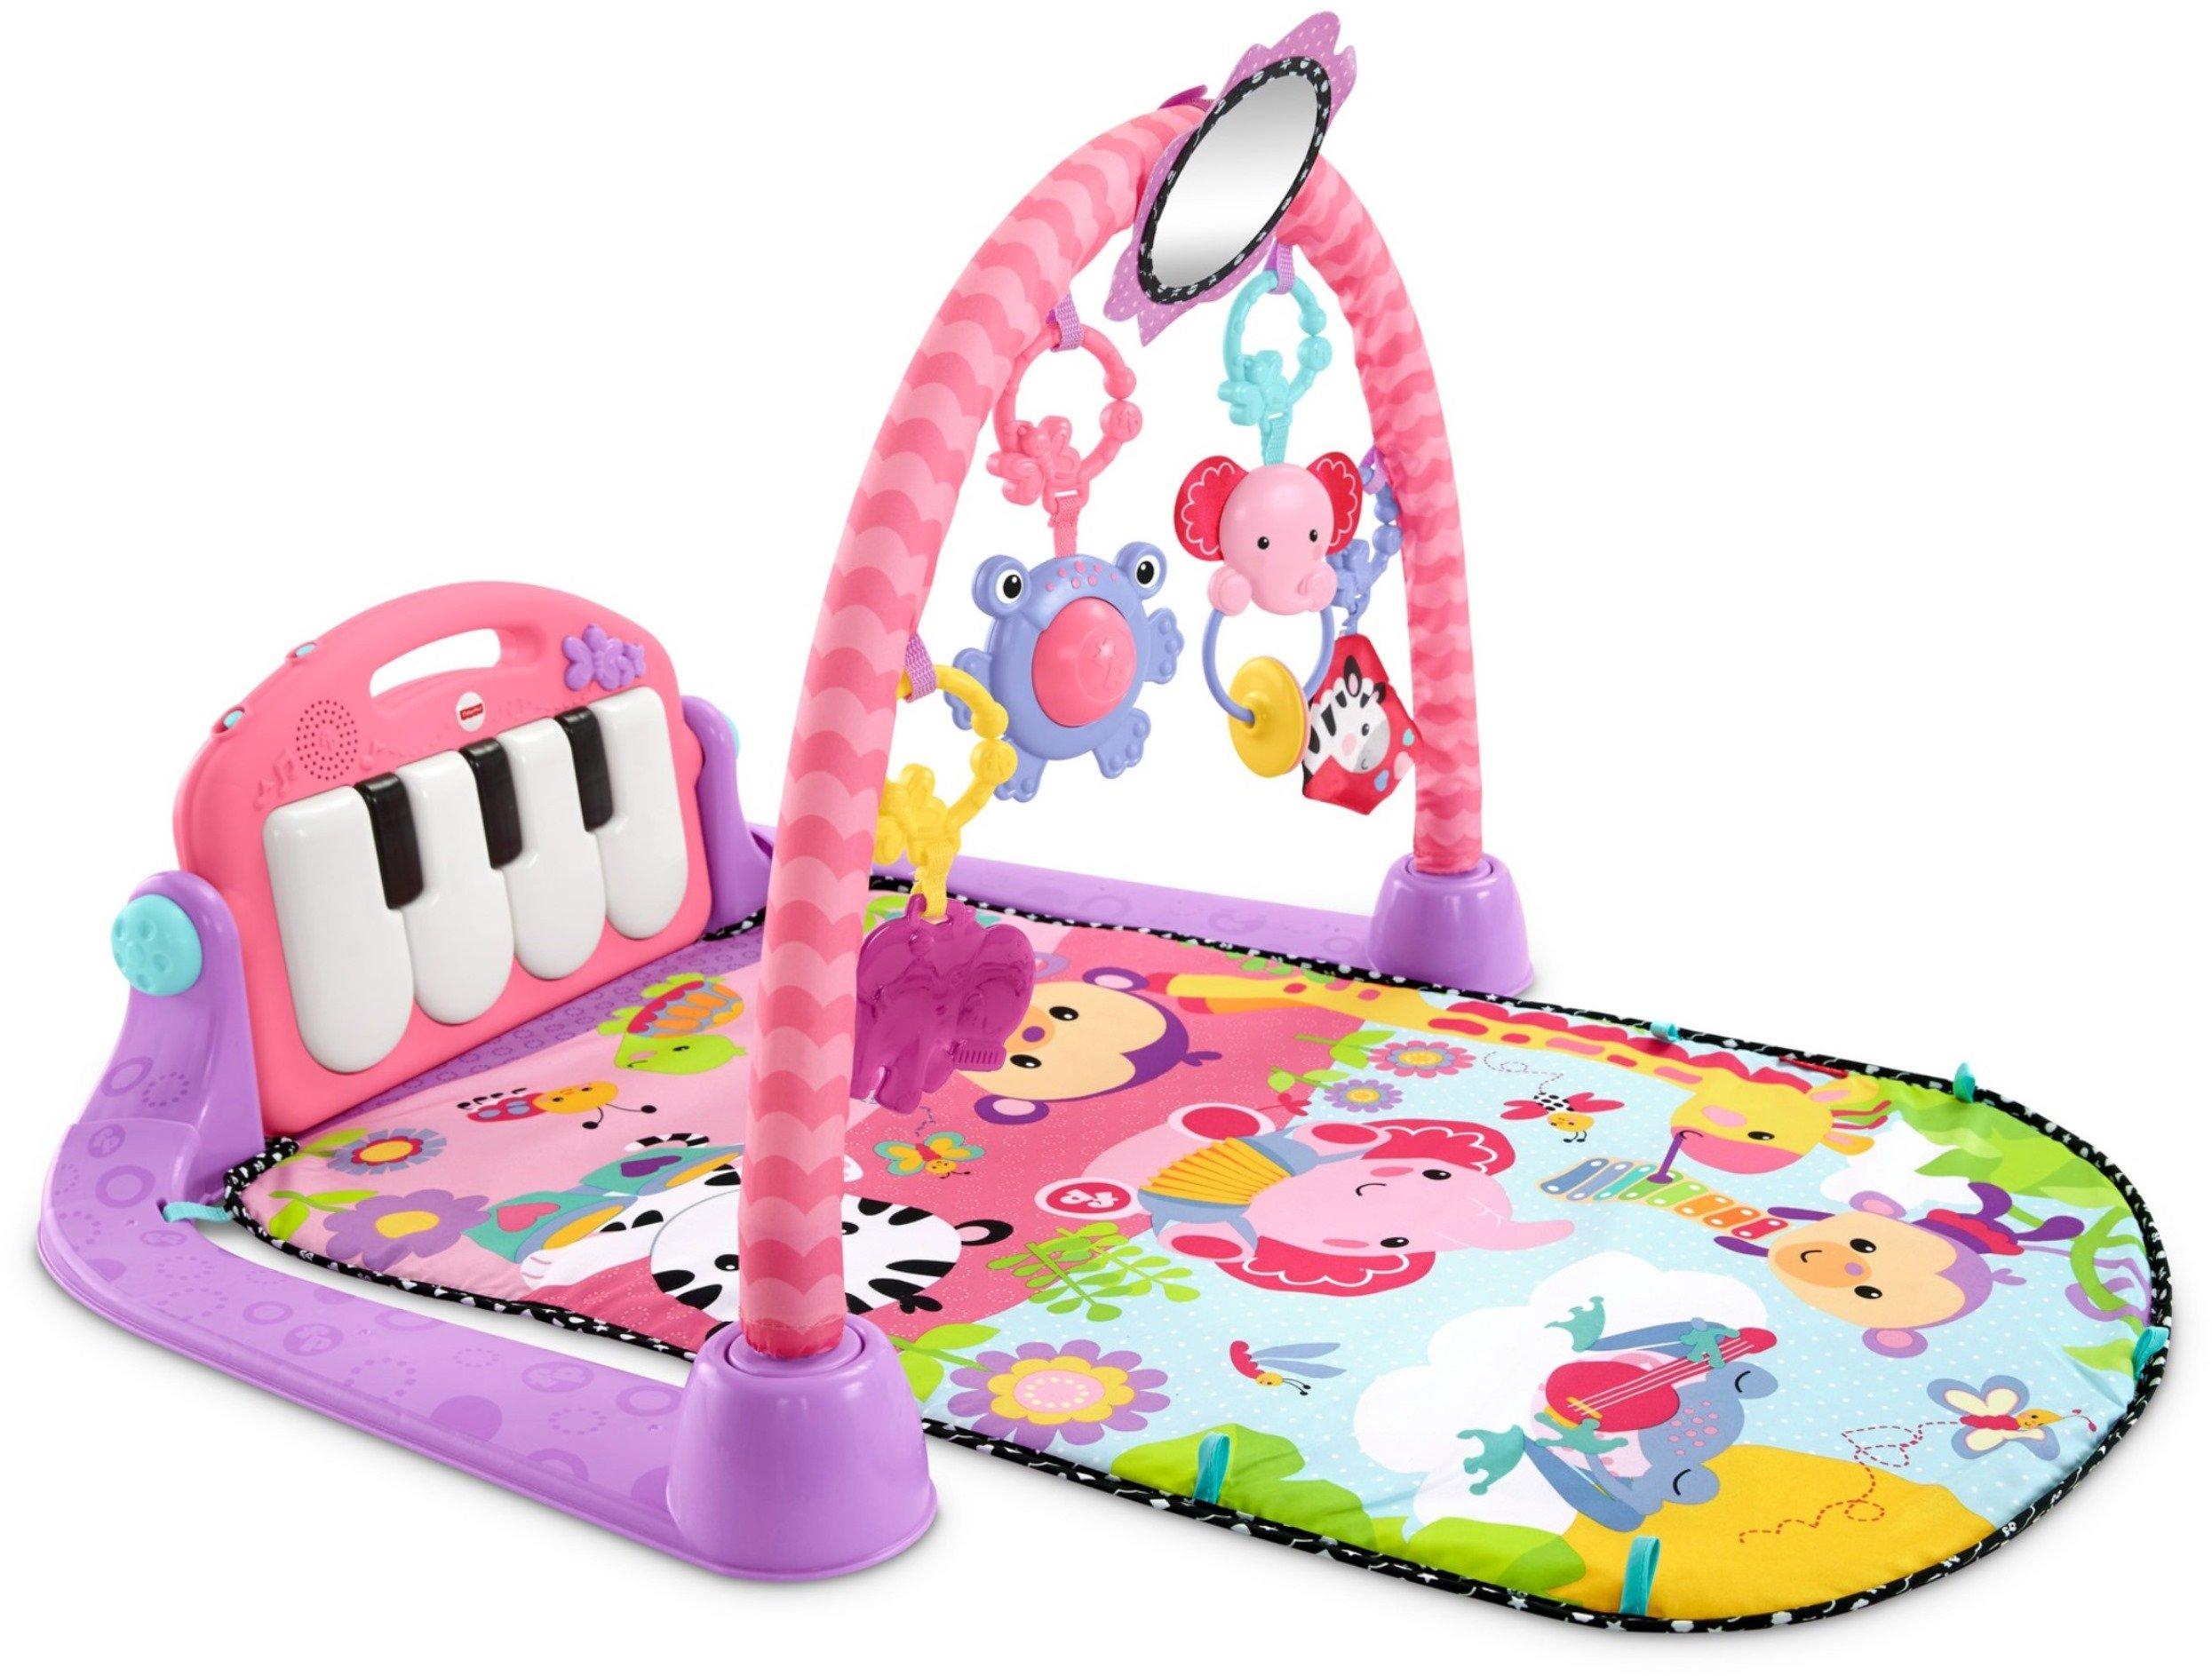 Fisher-Price Kick 'n Play Piano Gym, Pink